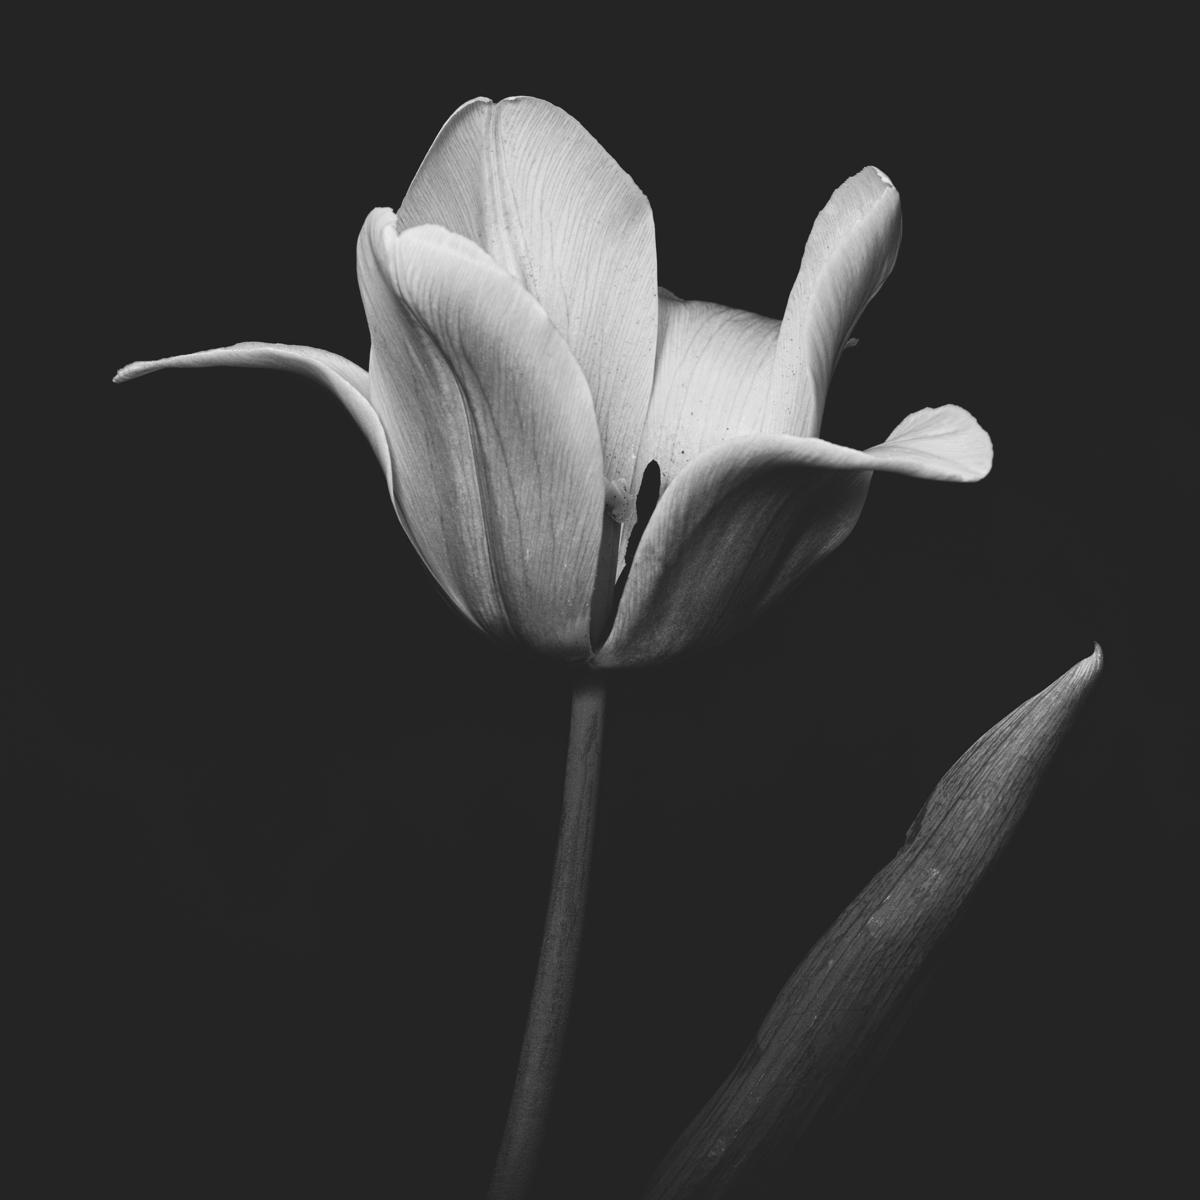 Tulip #157 (large view)